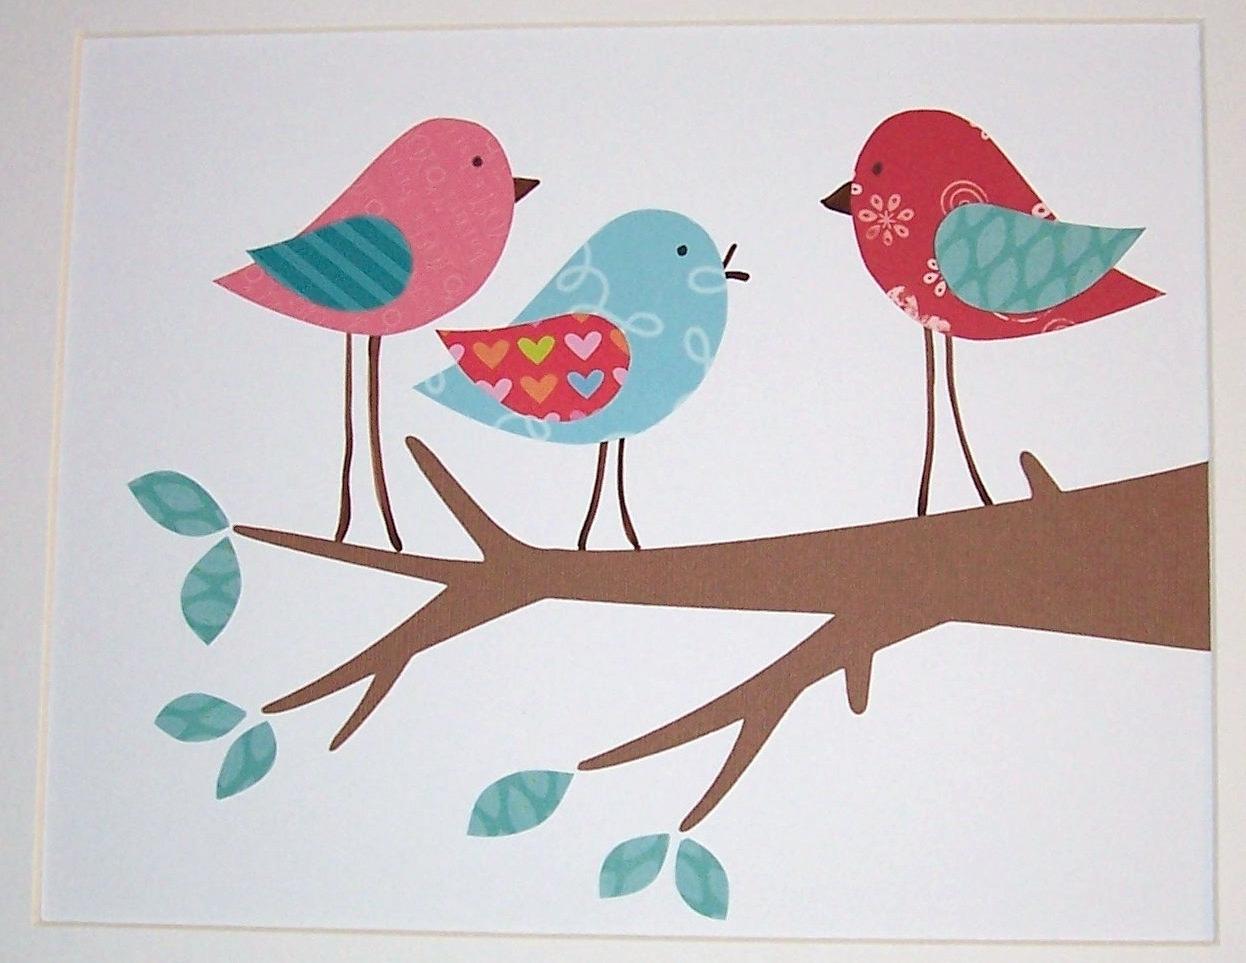 Most Current Red And Turquoise Wall Art Regarding Nursery Art, Kids Wall Art, Children's Room Decor, Birds, Aqua (View 5 of 15)